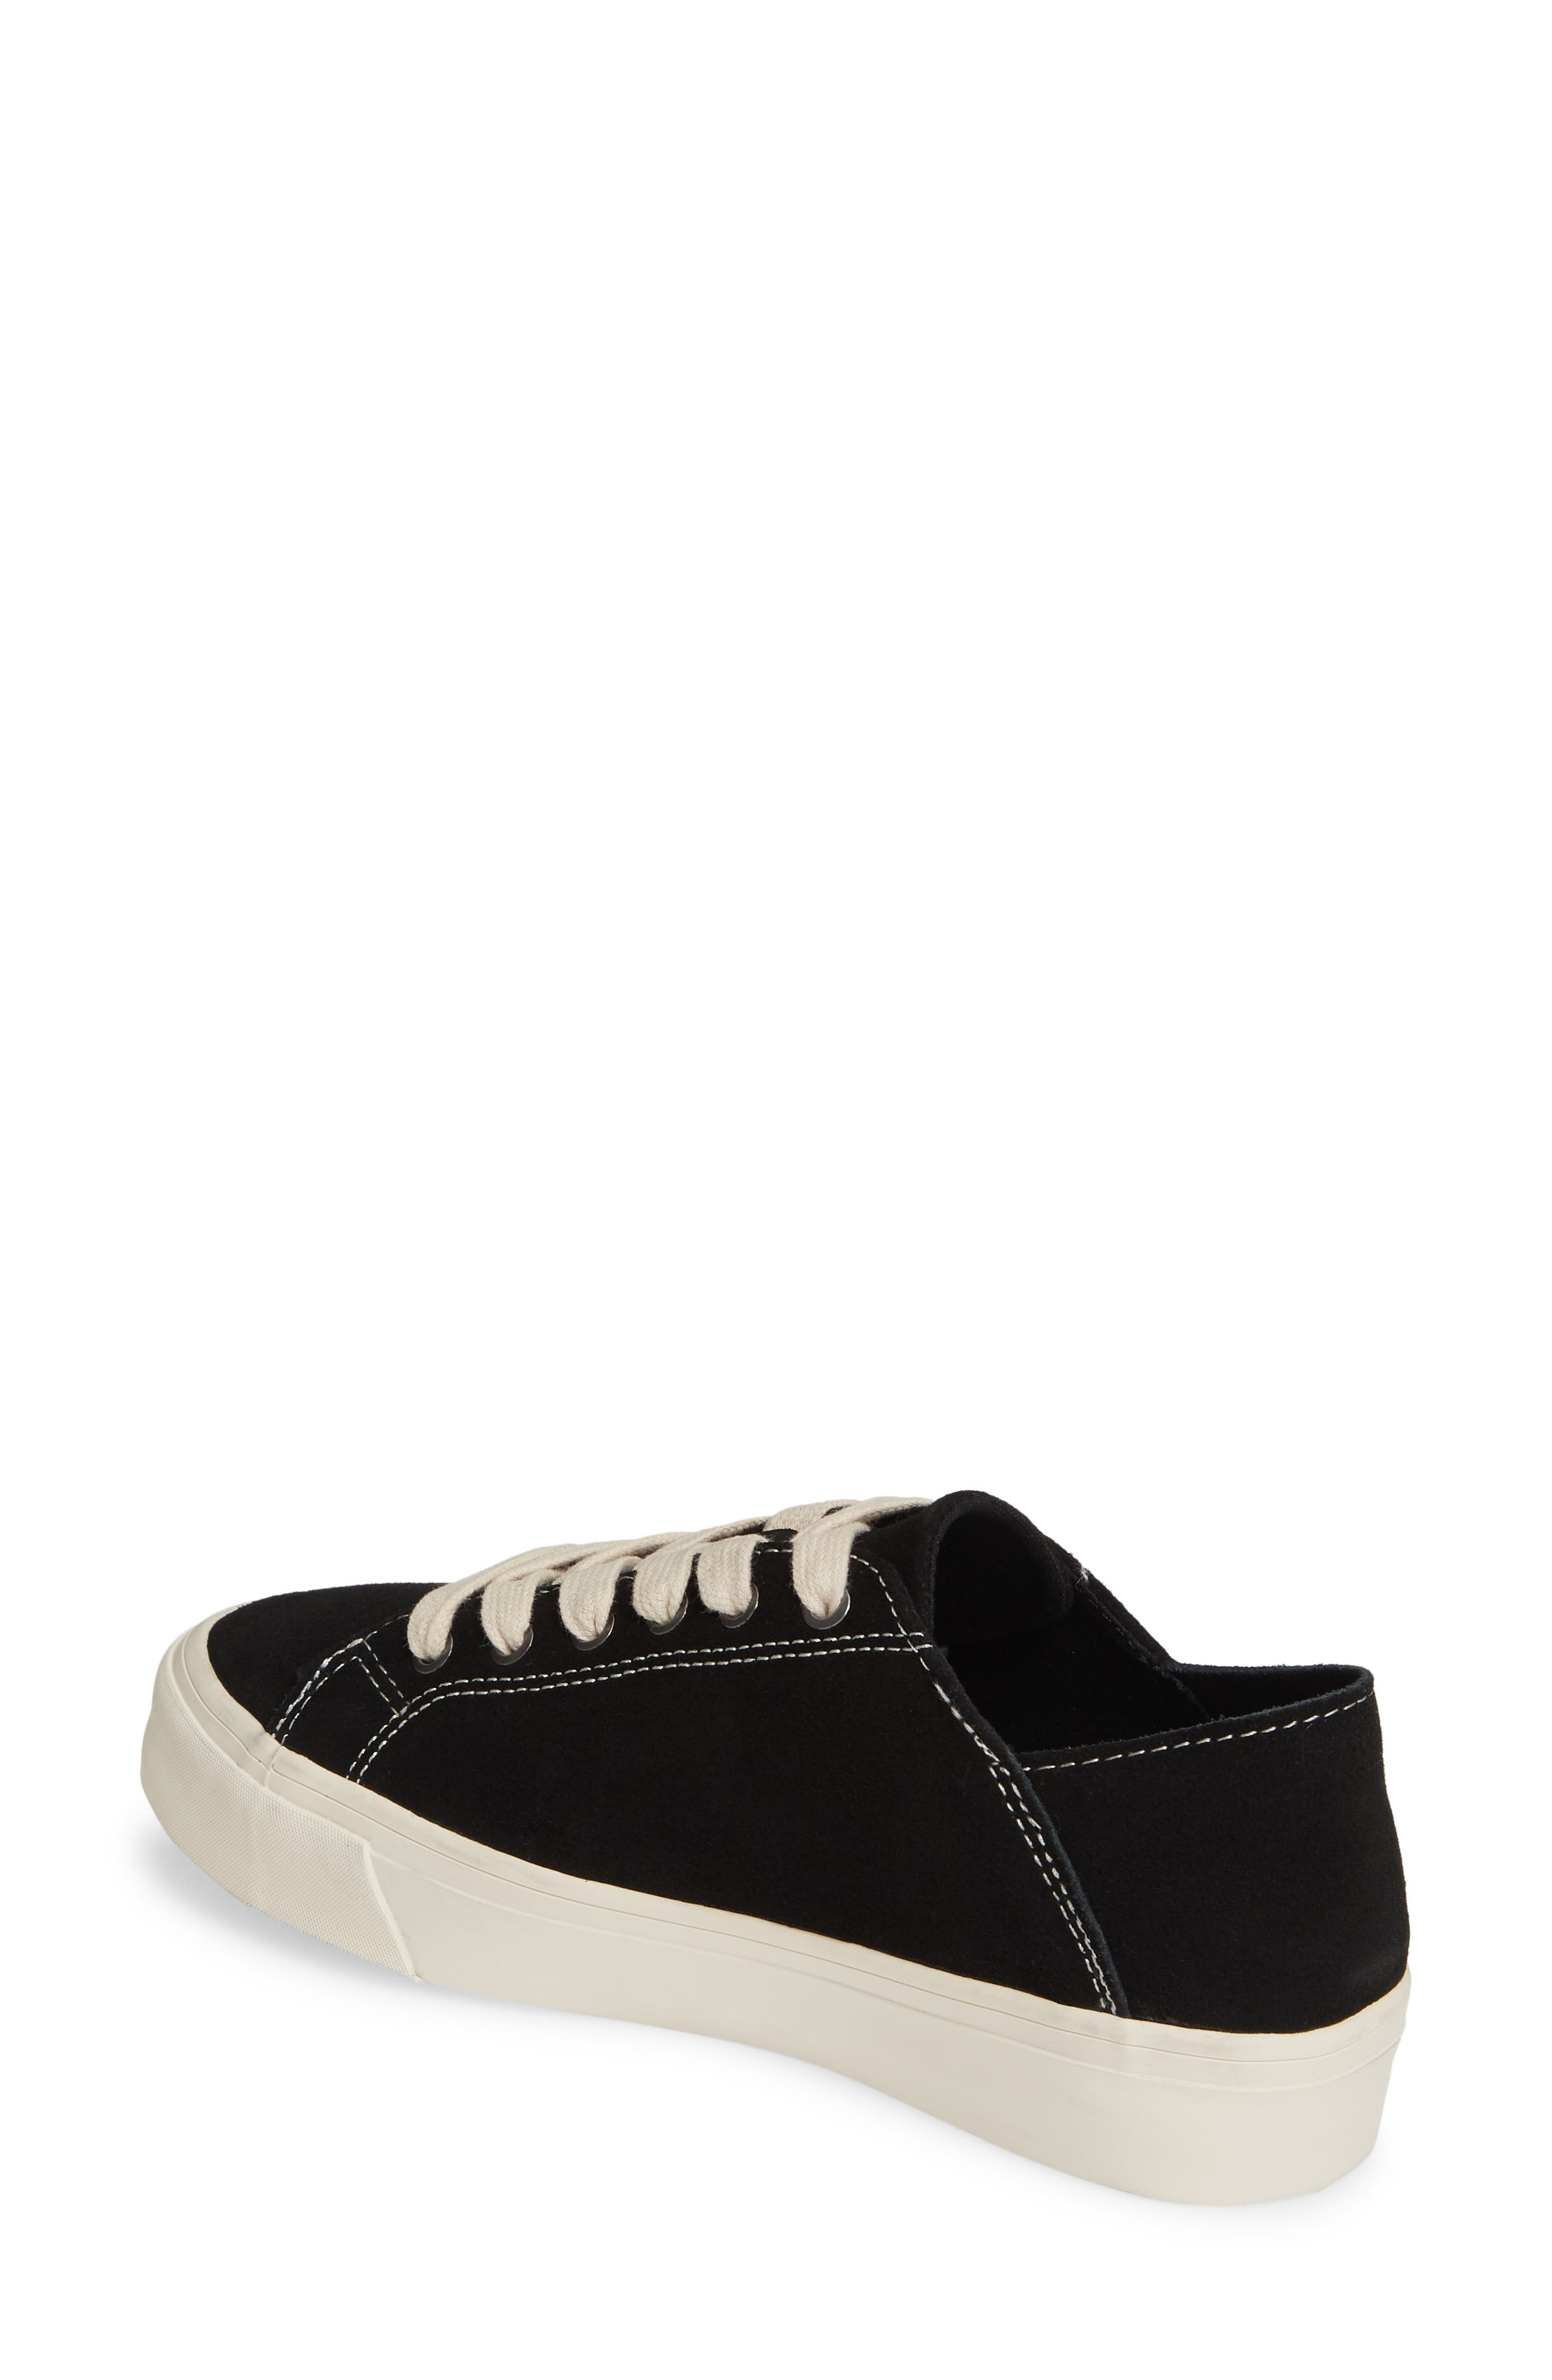 SEAVEES,                             Sausalito Sneaker,                             Alternate thumbnail 2, color,                             BLACK/ BLACK